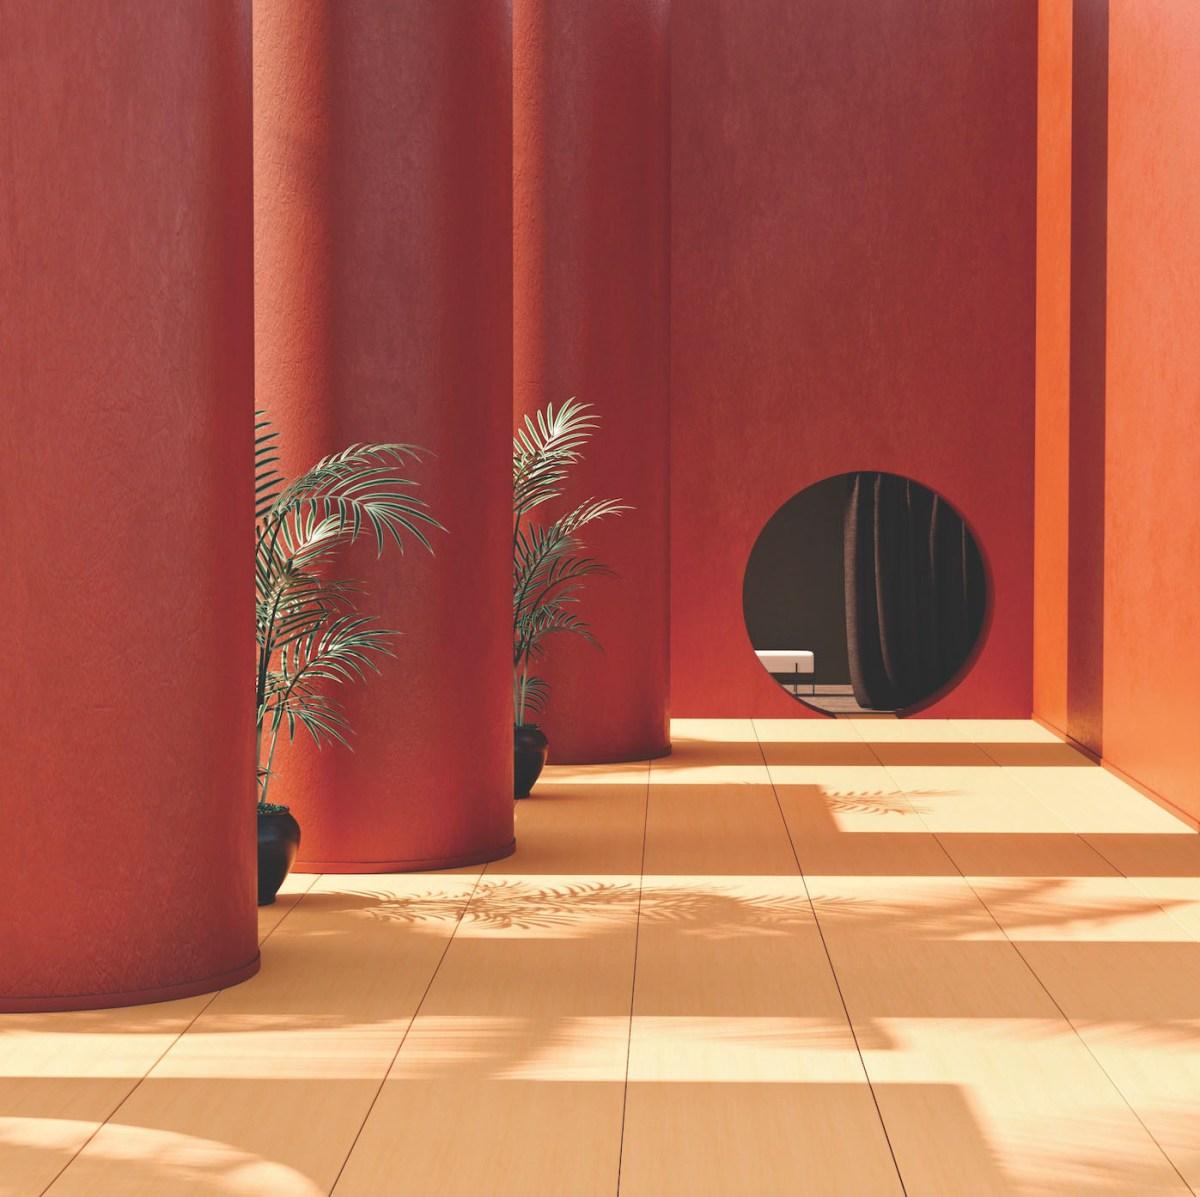 Digital-surrealists-Chris-Barneau-3